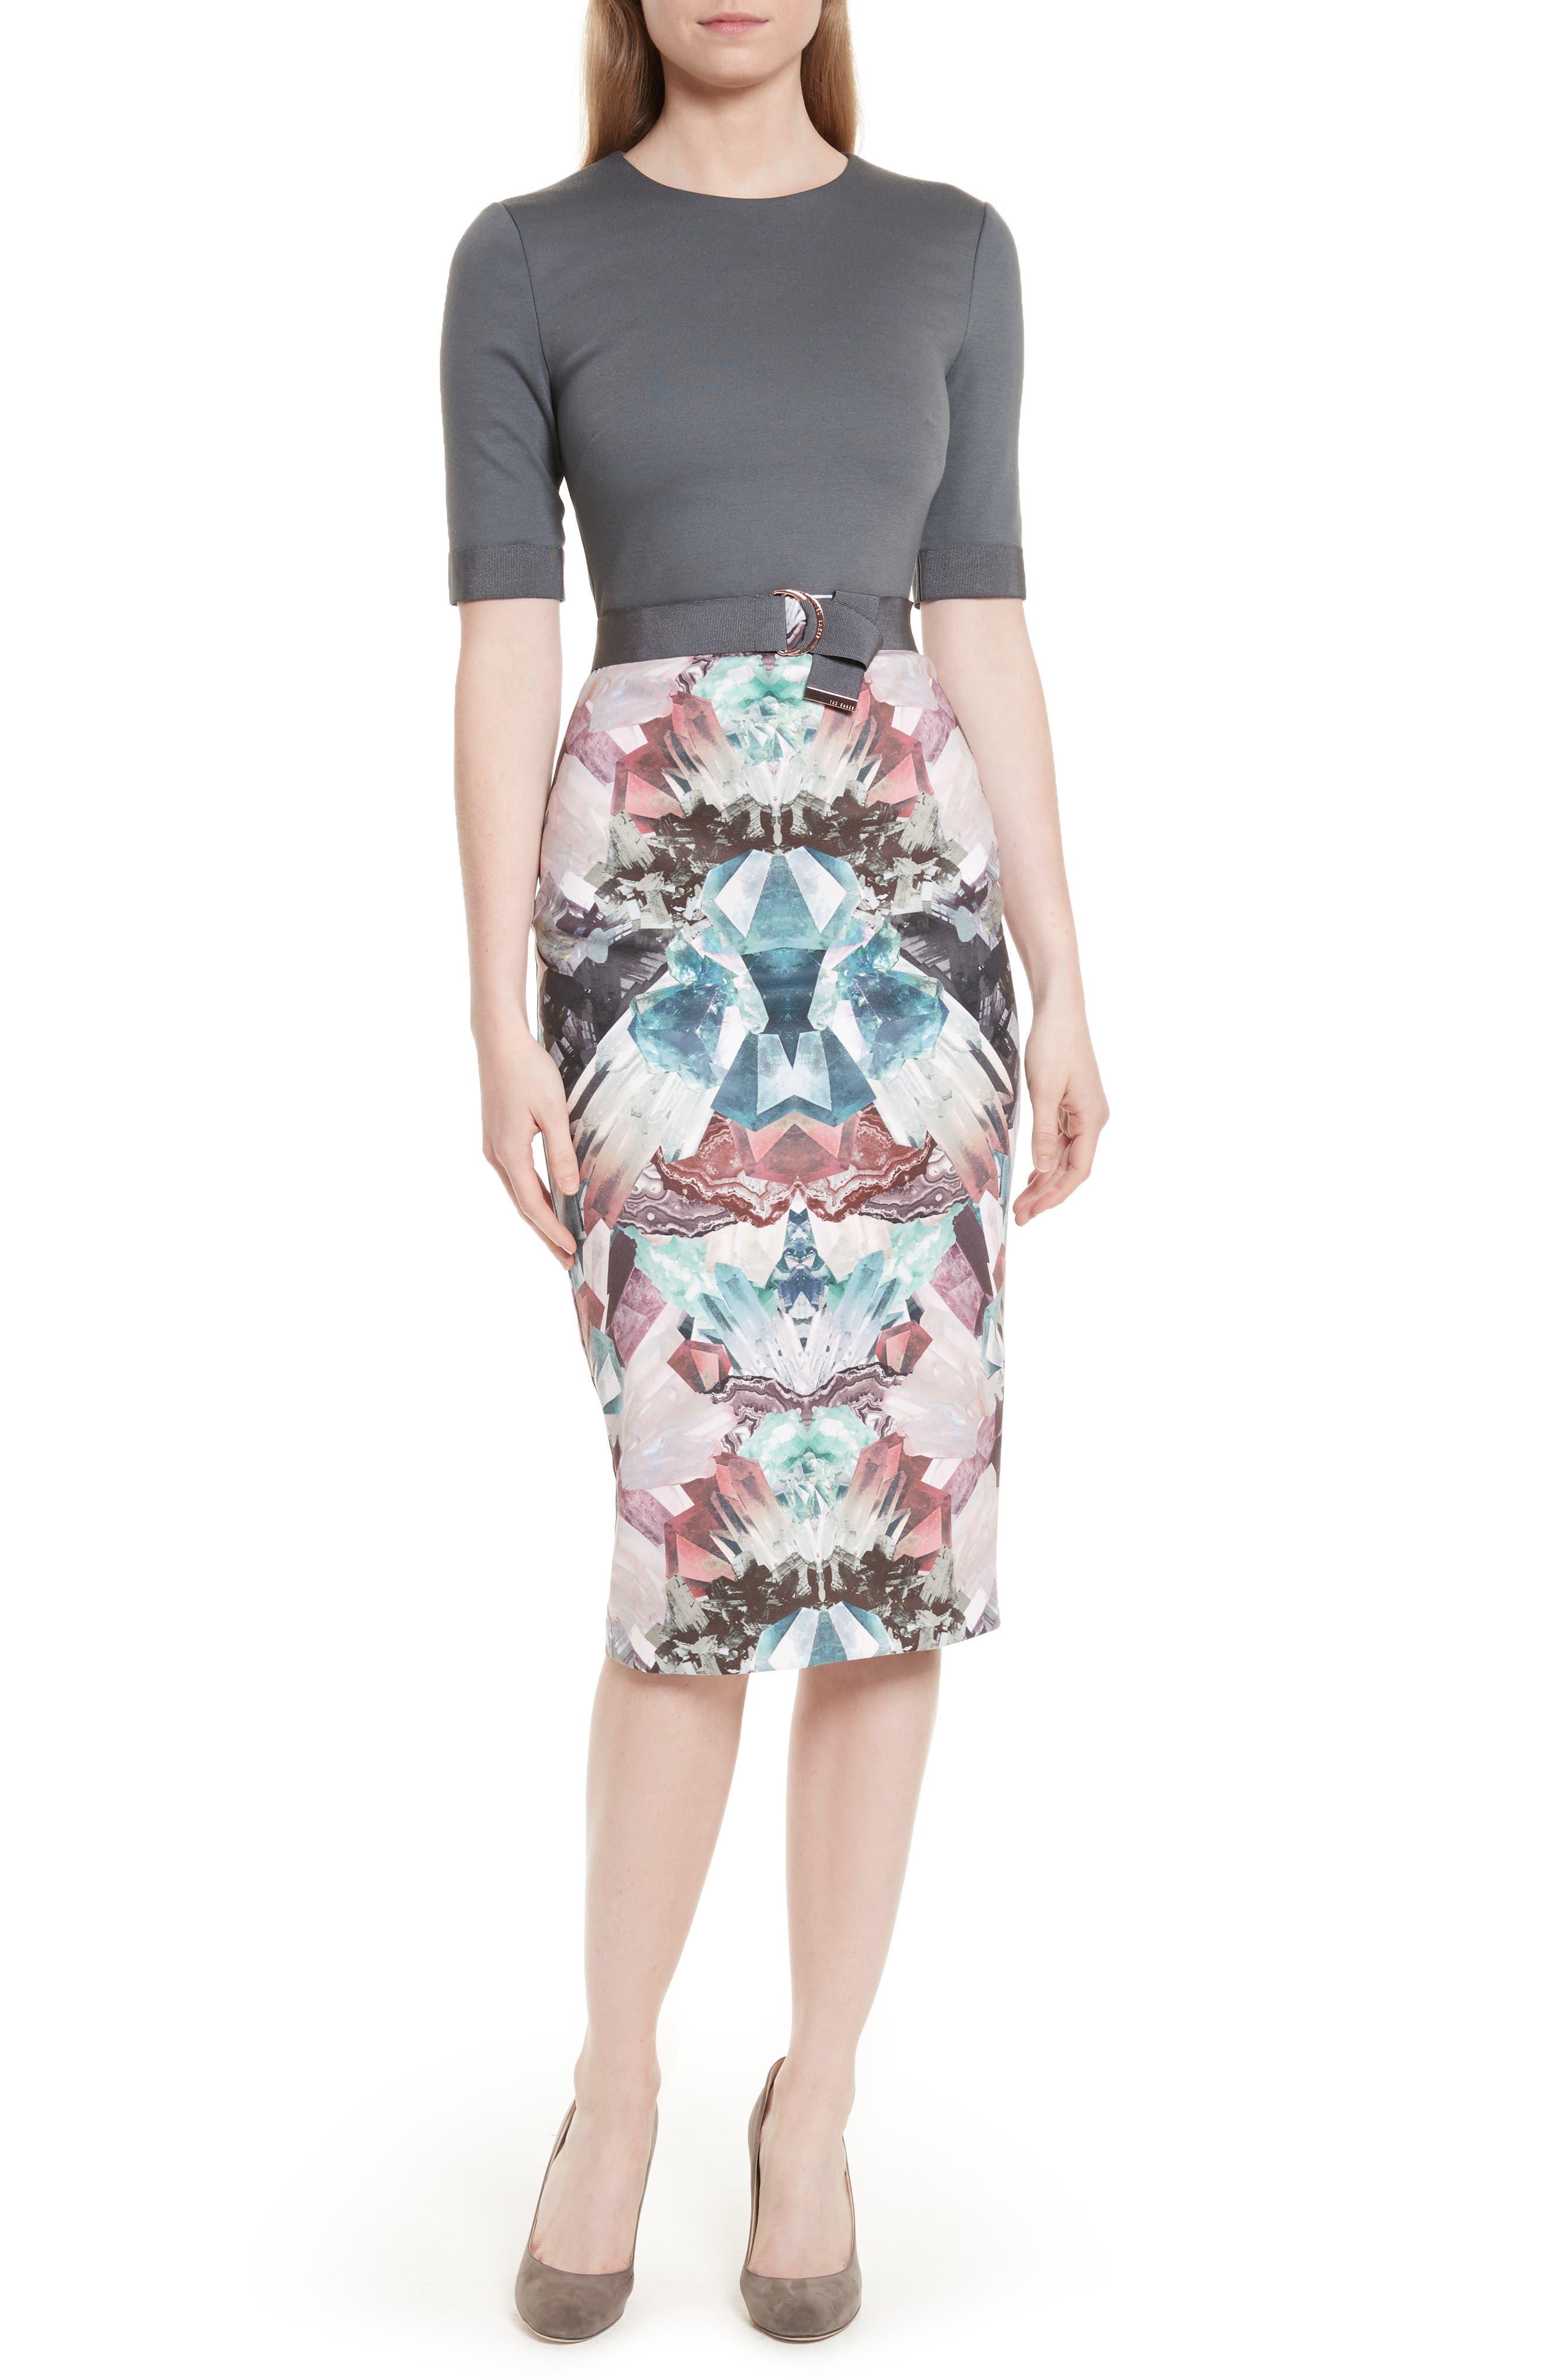 Main Image - Ted Baker London Anaste Mirror Minerals Print Dress